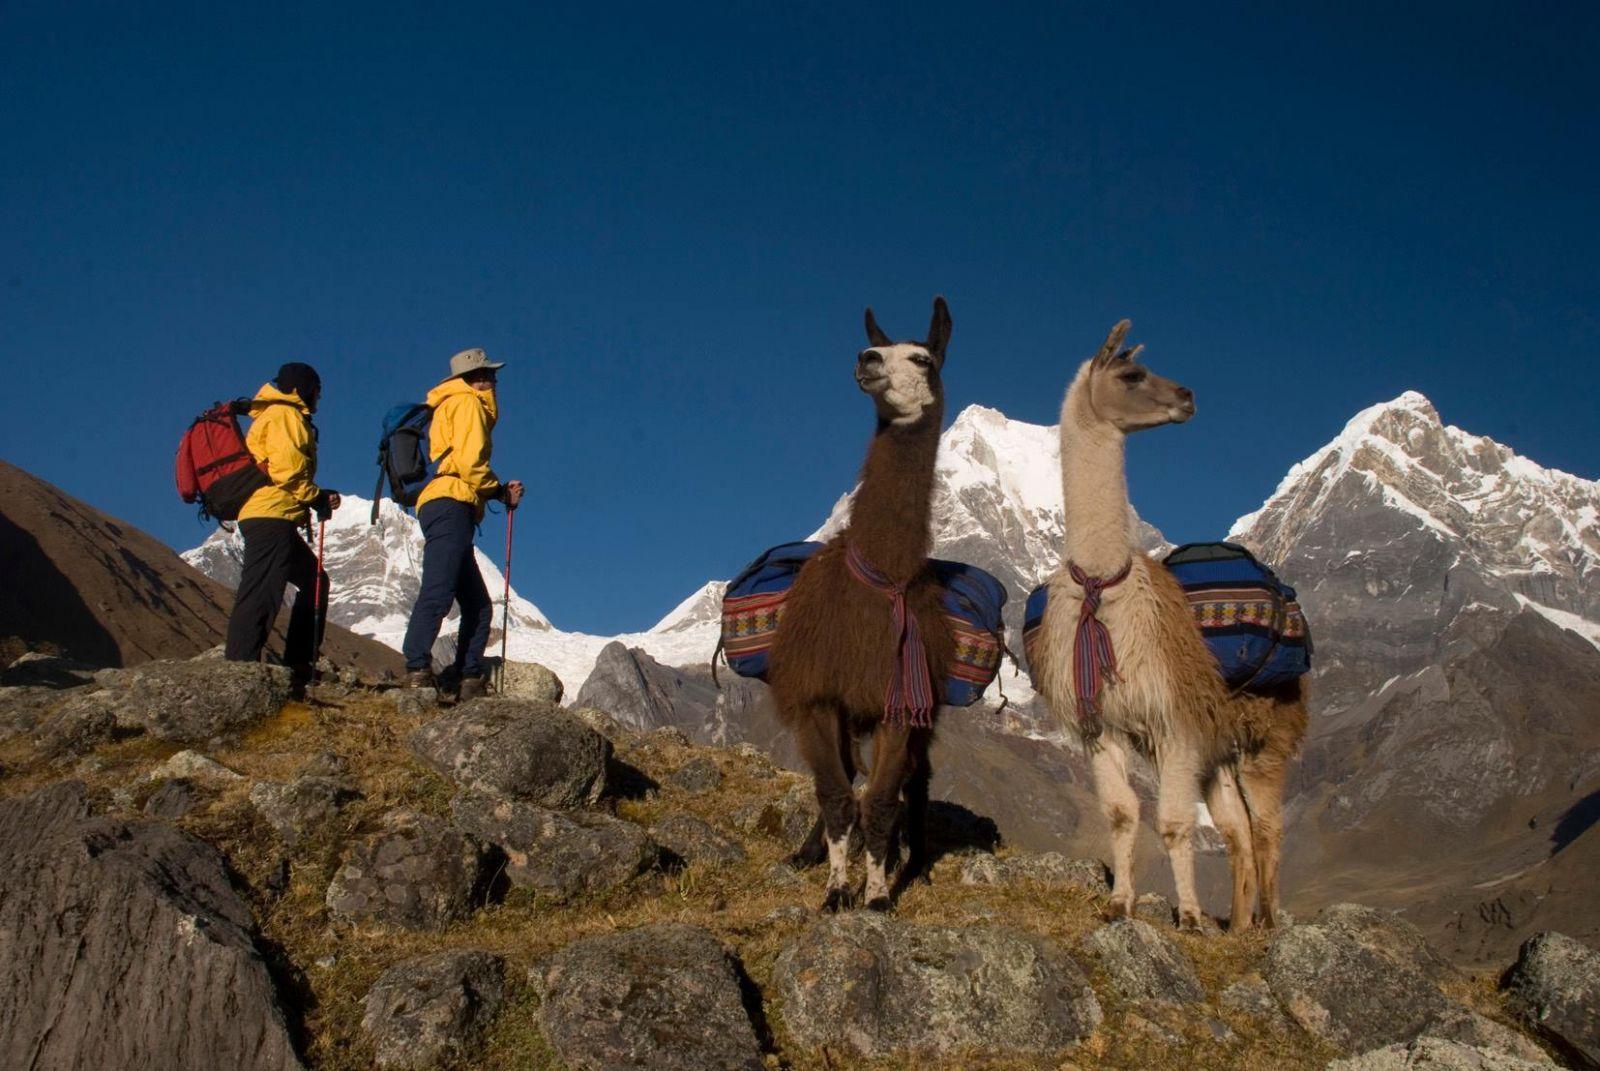 Olleros-Chavin Llama Trek, Peru